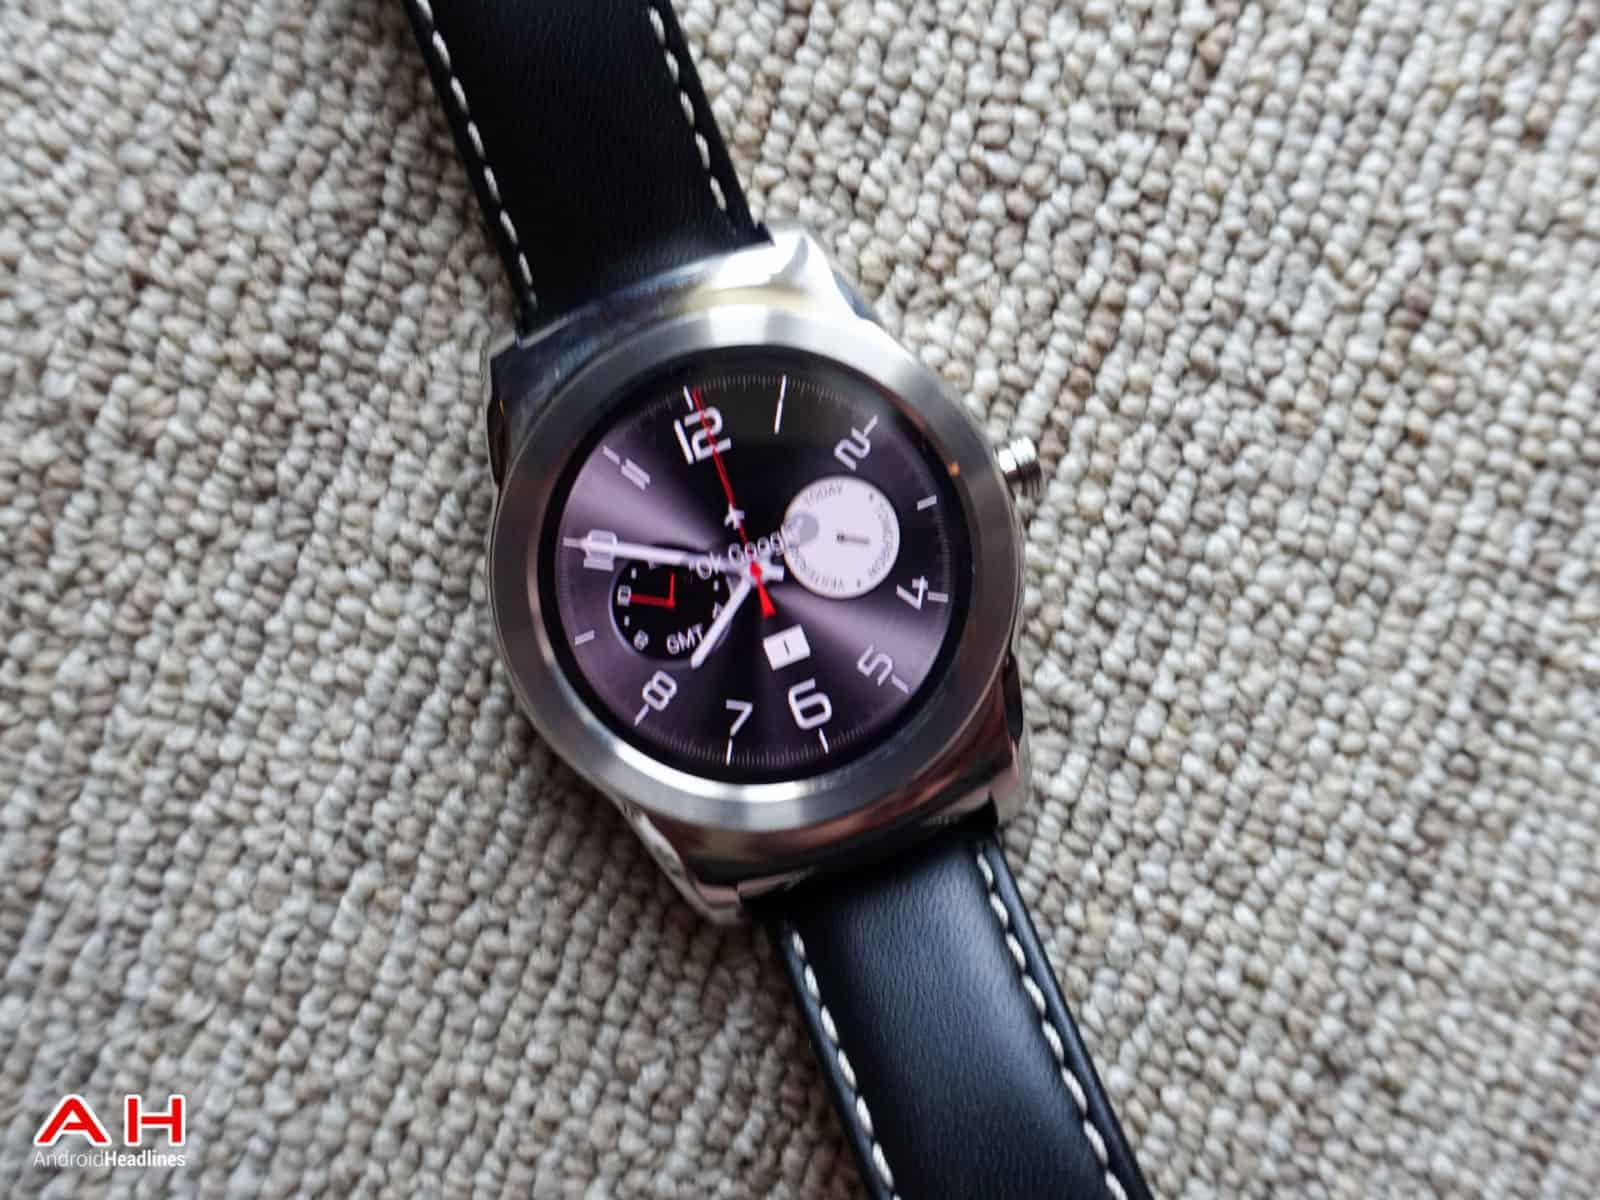 LG-Watch-Urbane-Review-AH-16